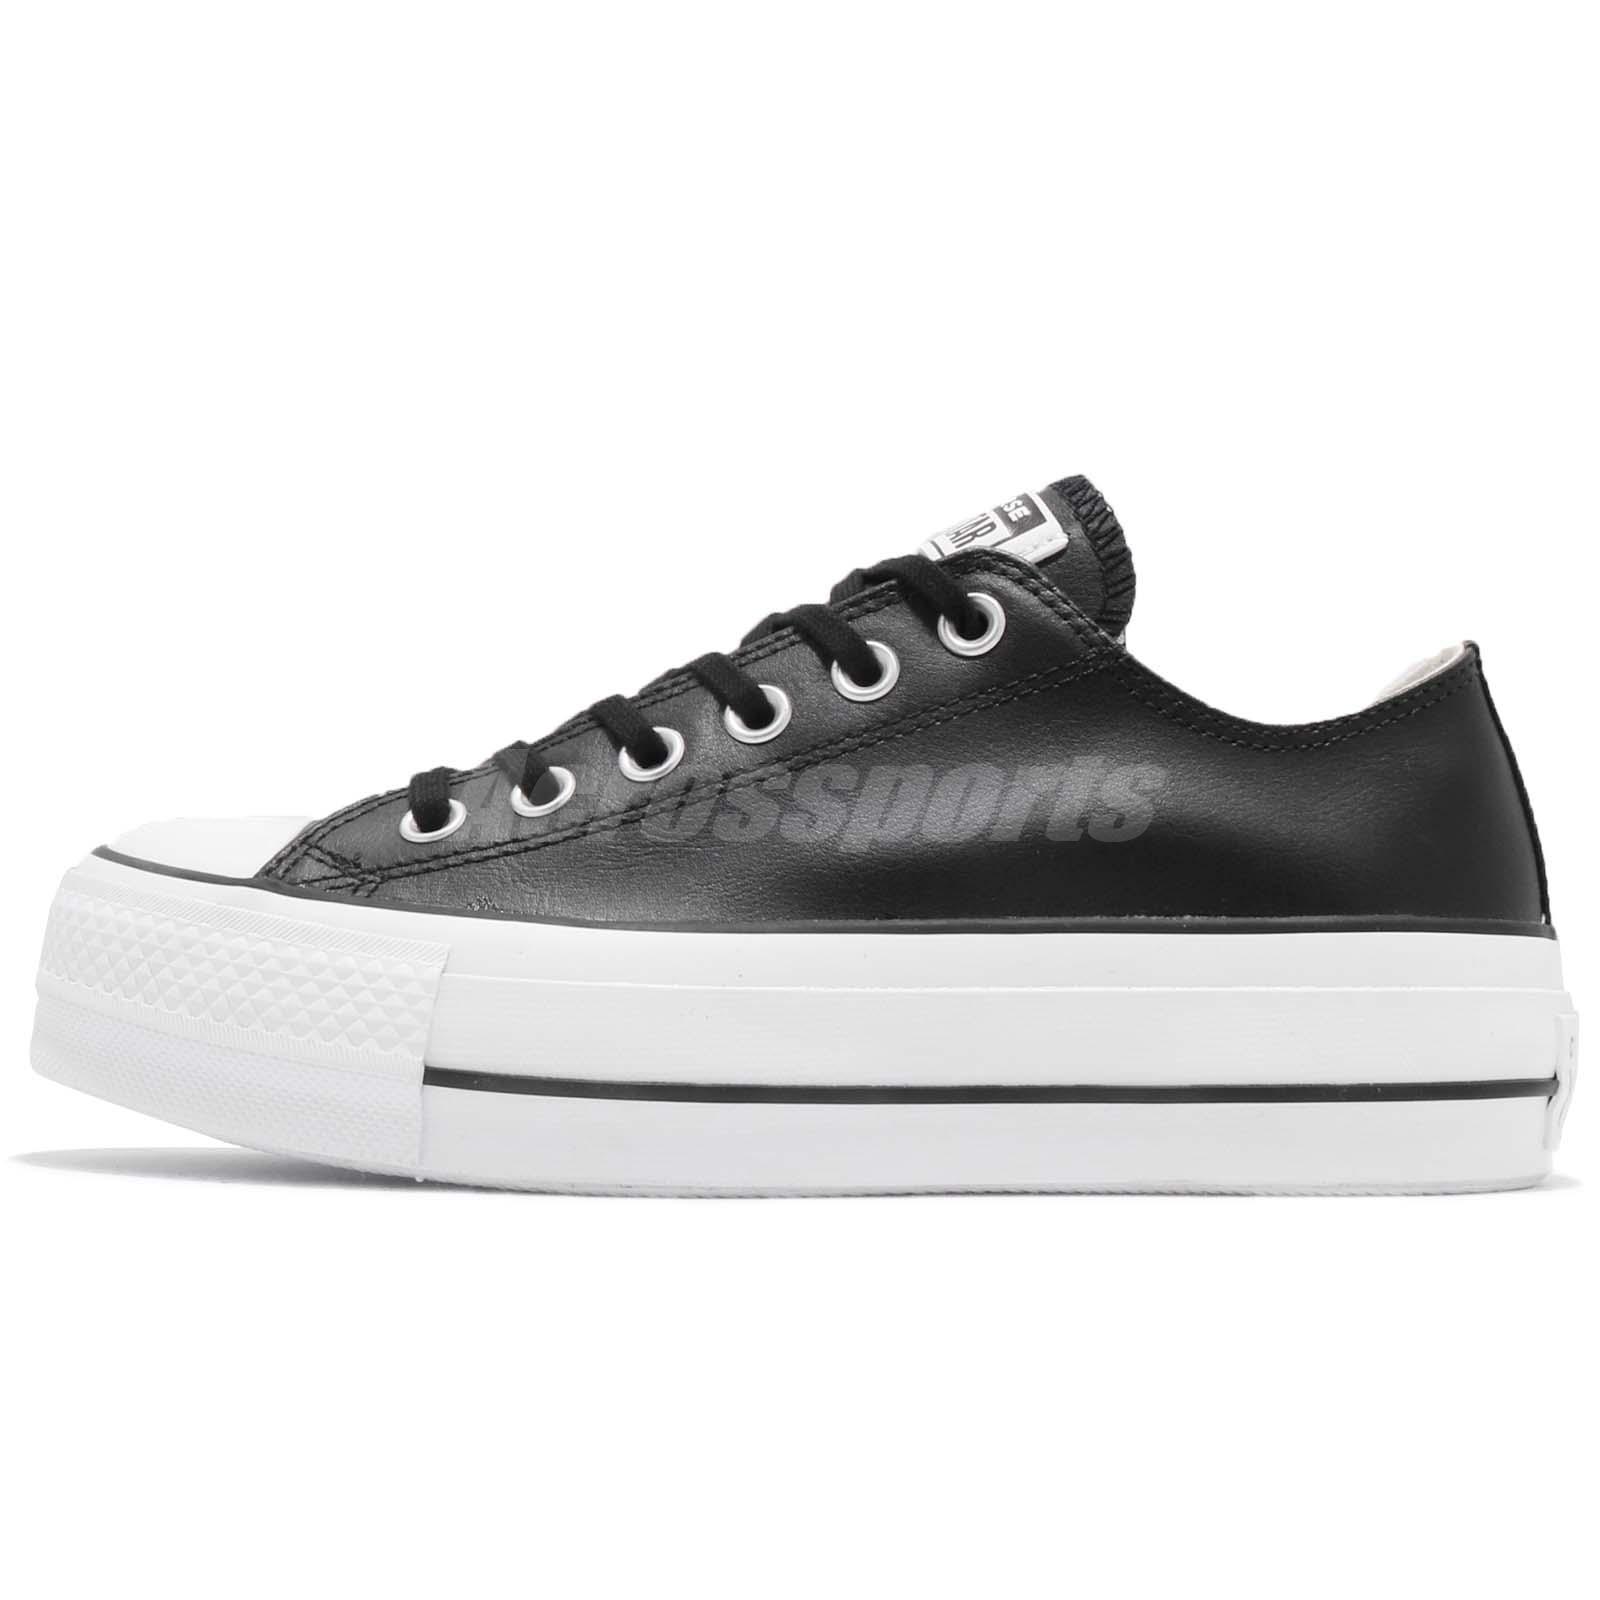 0bb5992dfd90 Converse Chuck Taylor All Star Lift Clean OX Black White Women Shoes 561681C